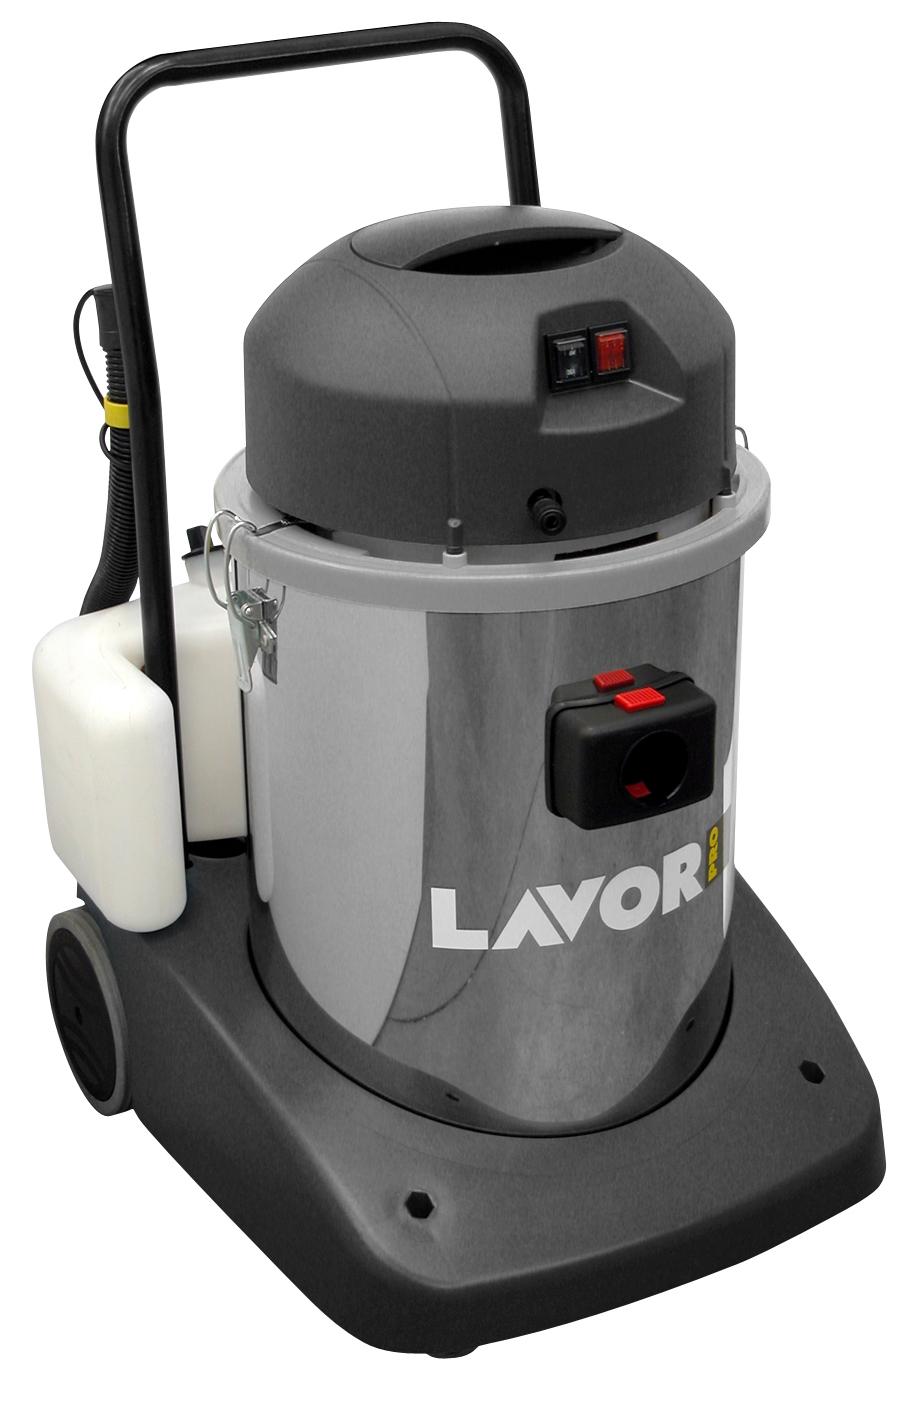 634725856808980627_Extraktor-APL-1400.jpg